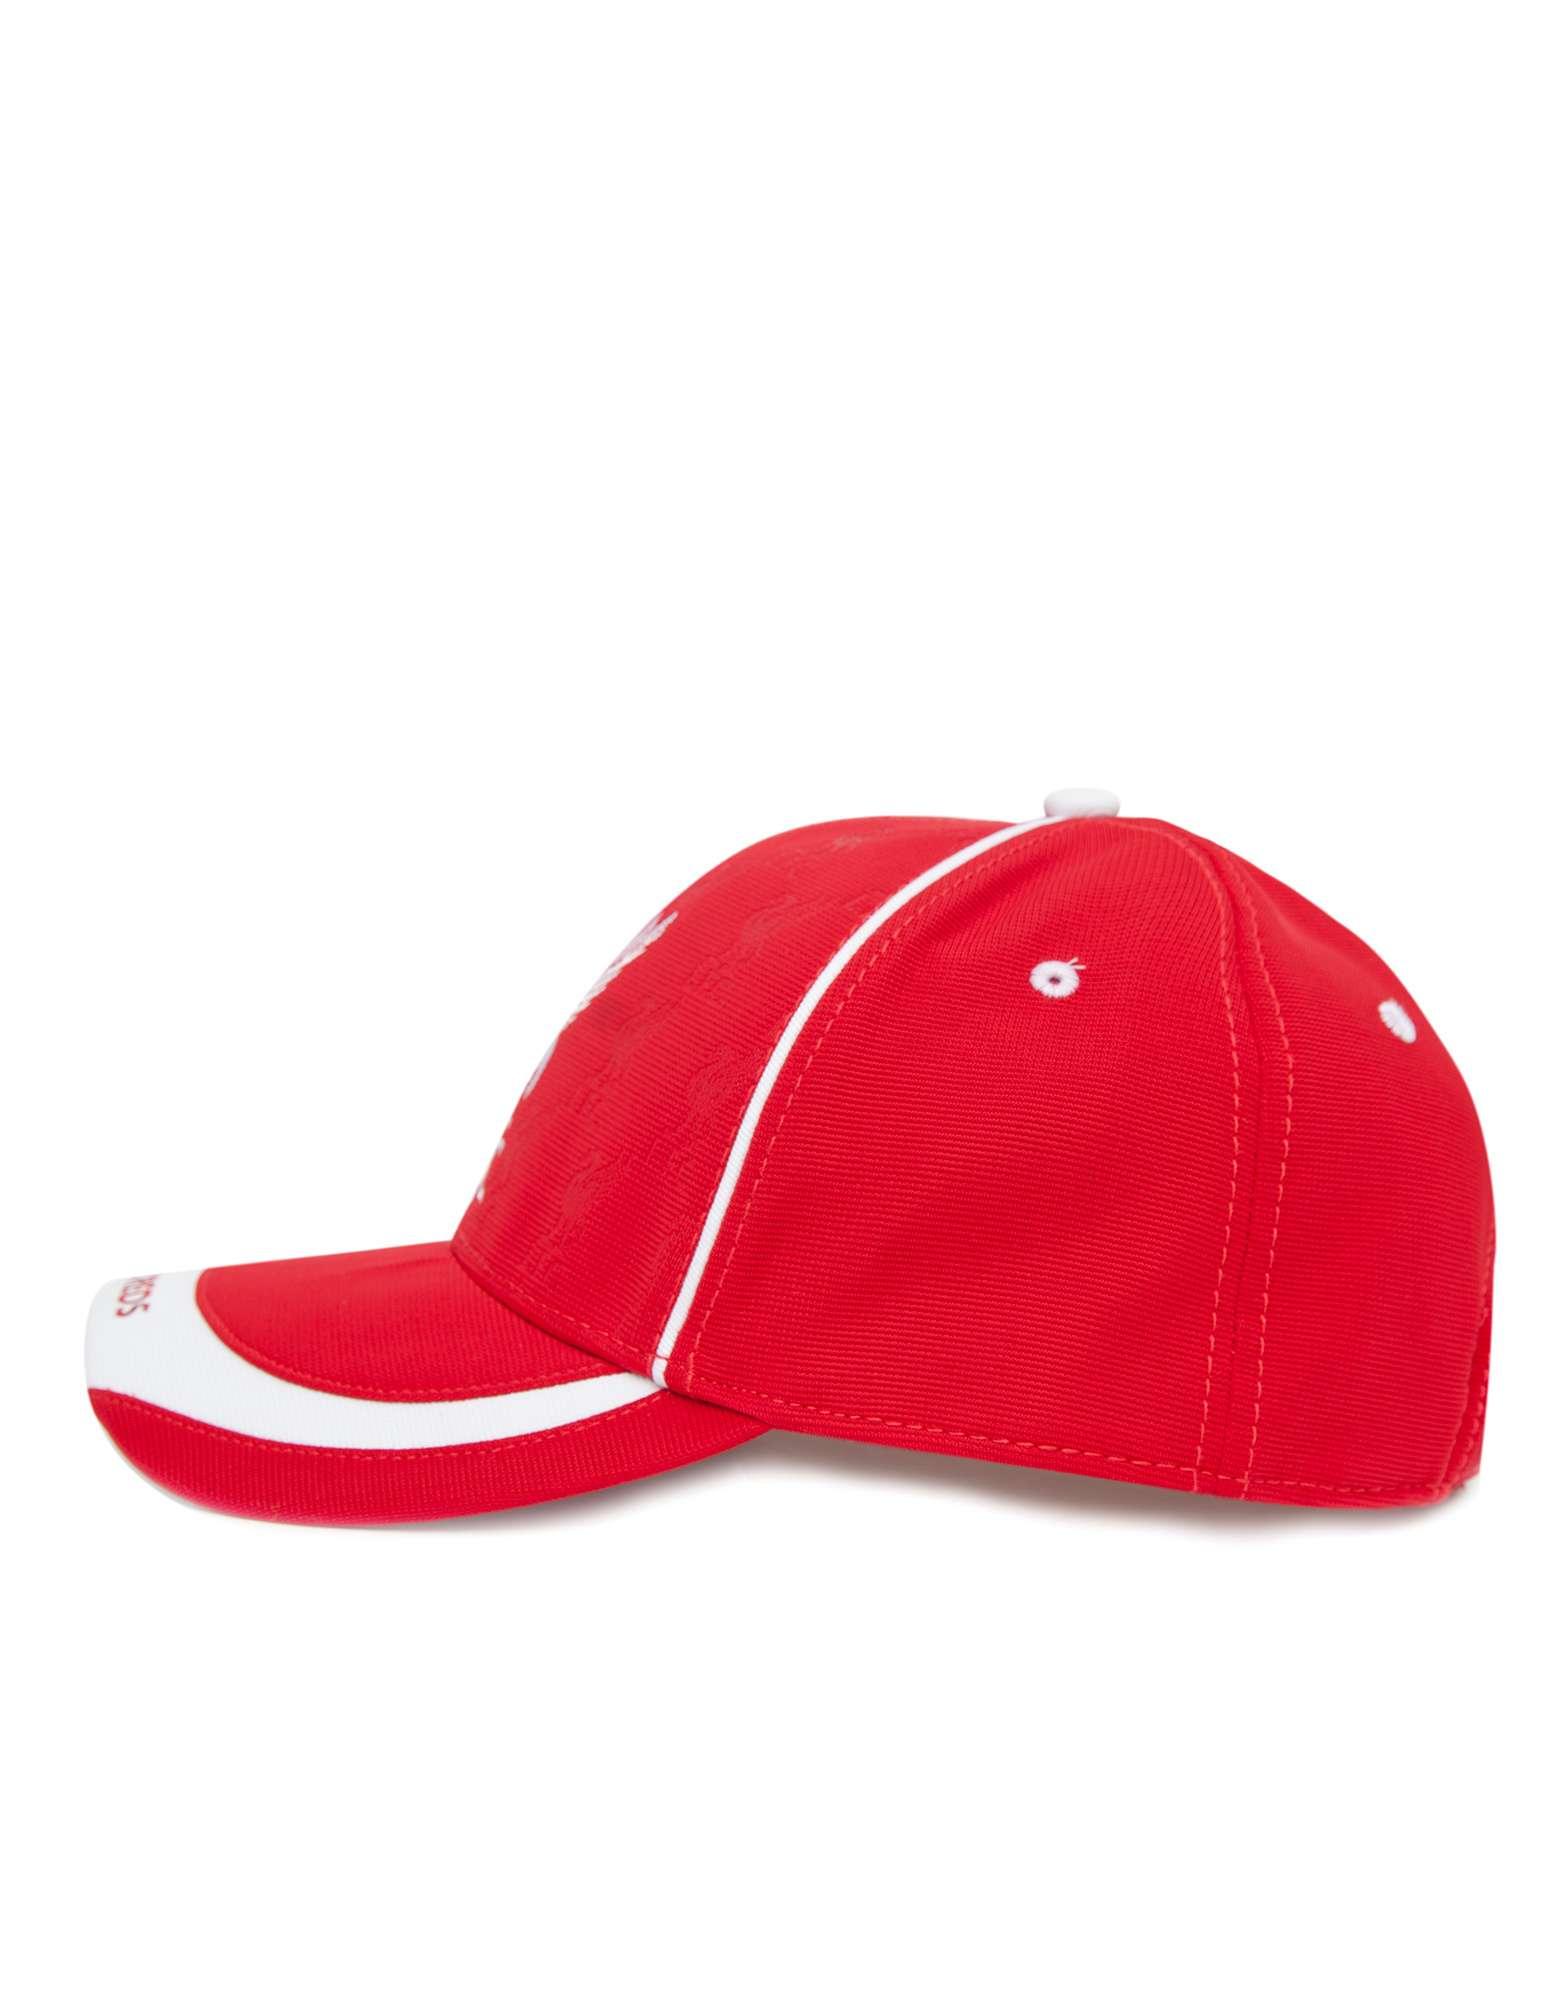 Official Team Liverpool FC Deboss Cap